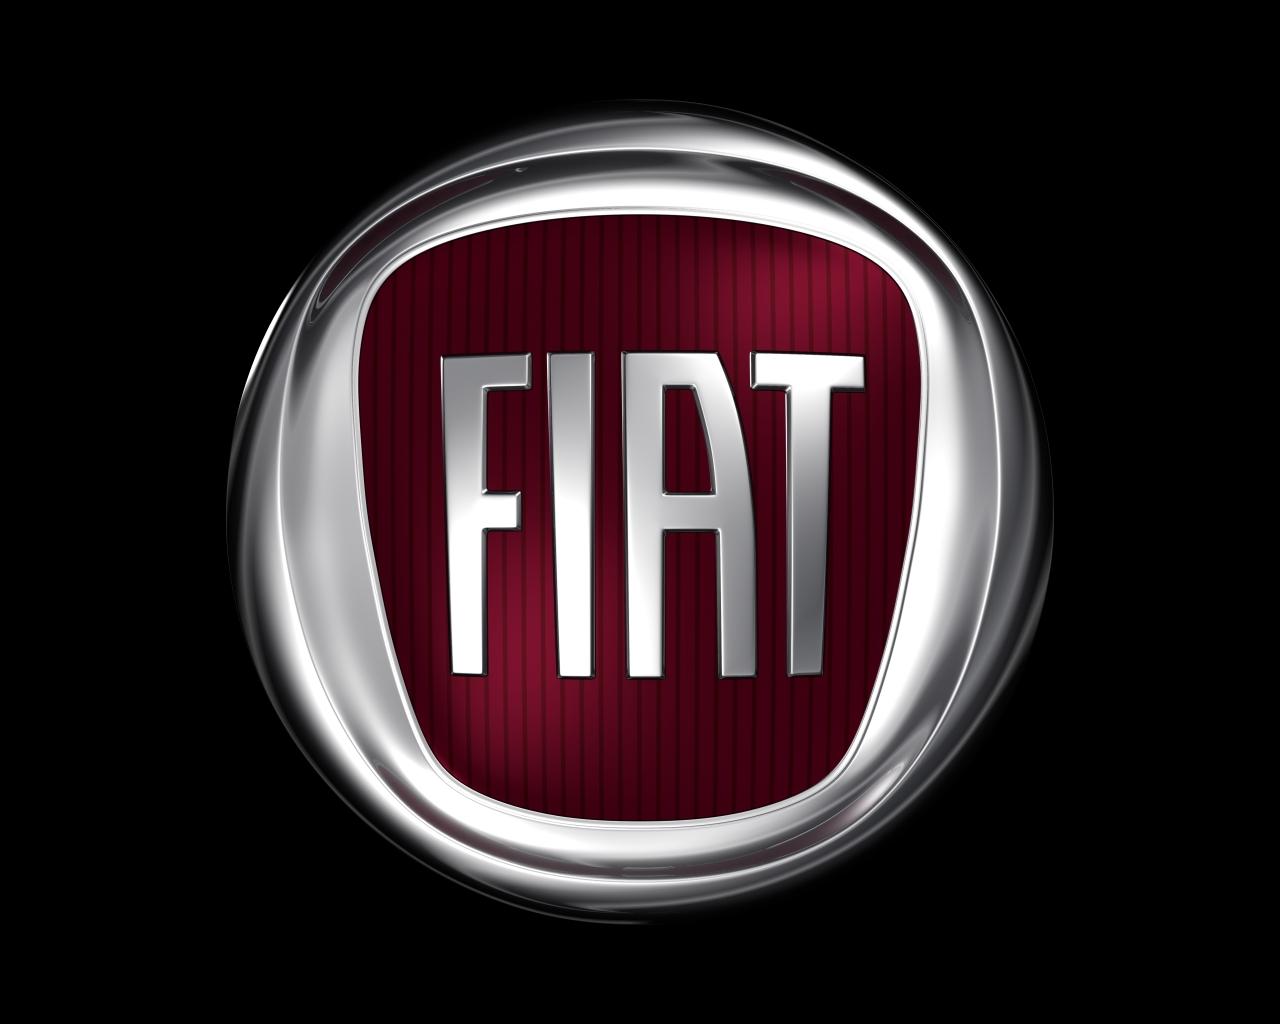 Car Logos And Their Brand Names >> All Car Brands, List of Car Brand Names and Logos